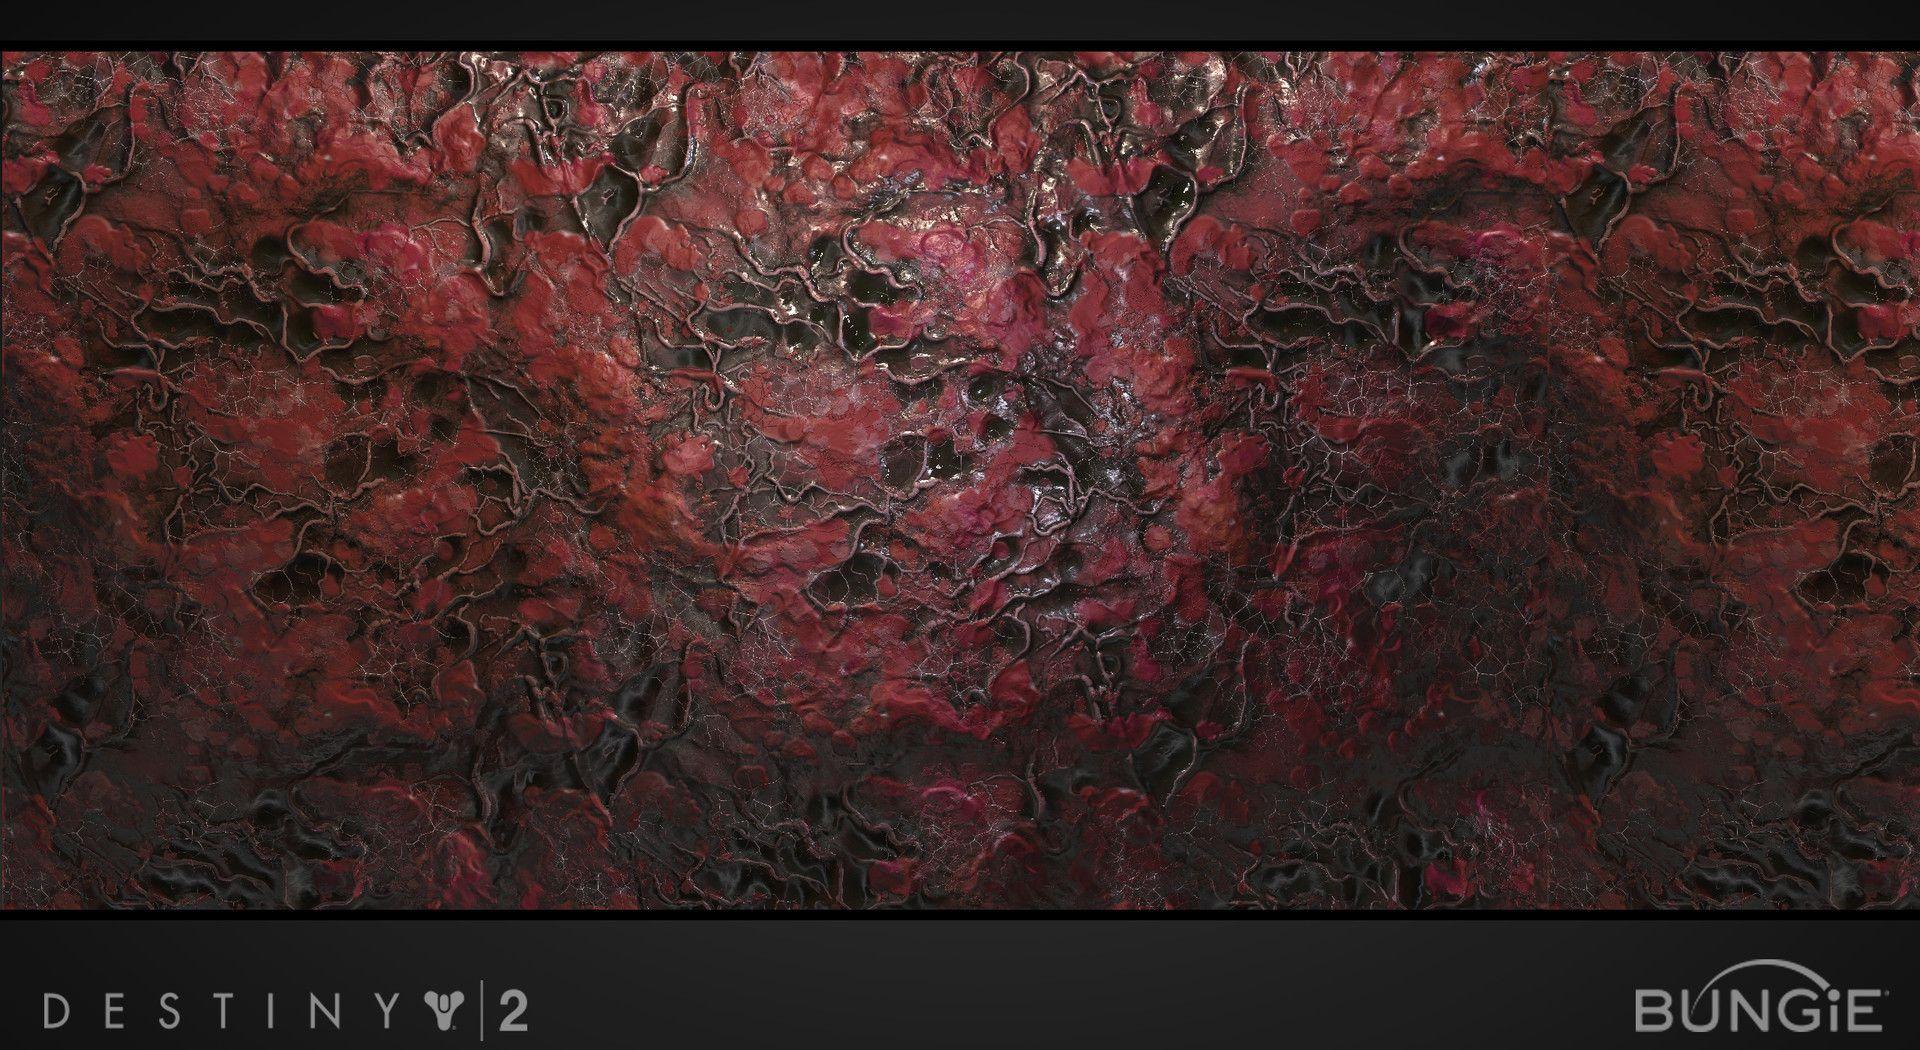 ArtStation - Destiny 2: Nessus Materials, Kevin Whitmeyer